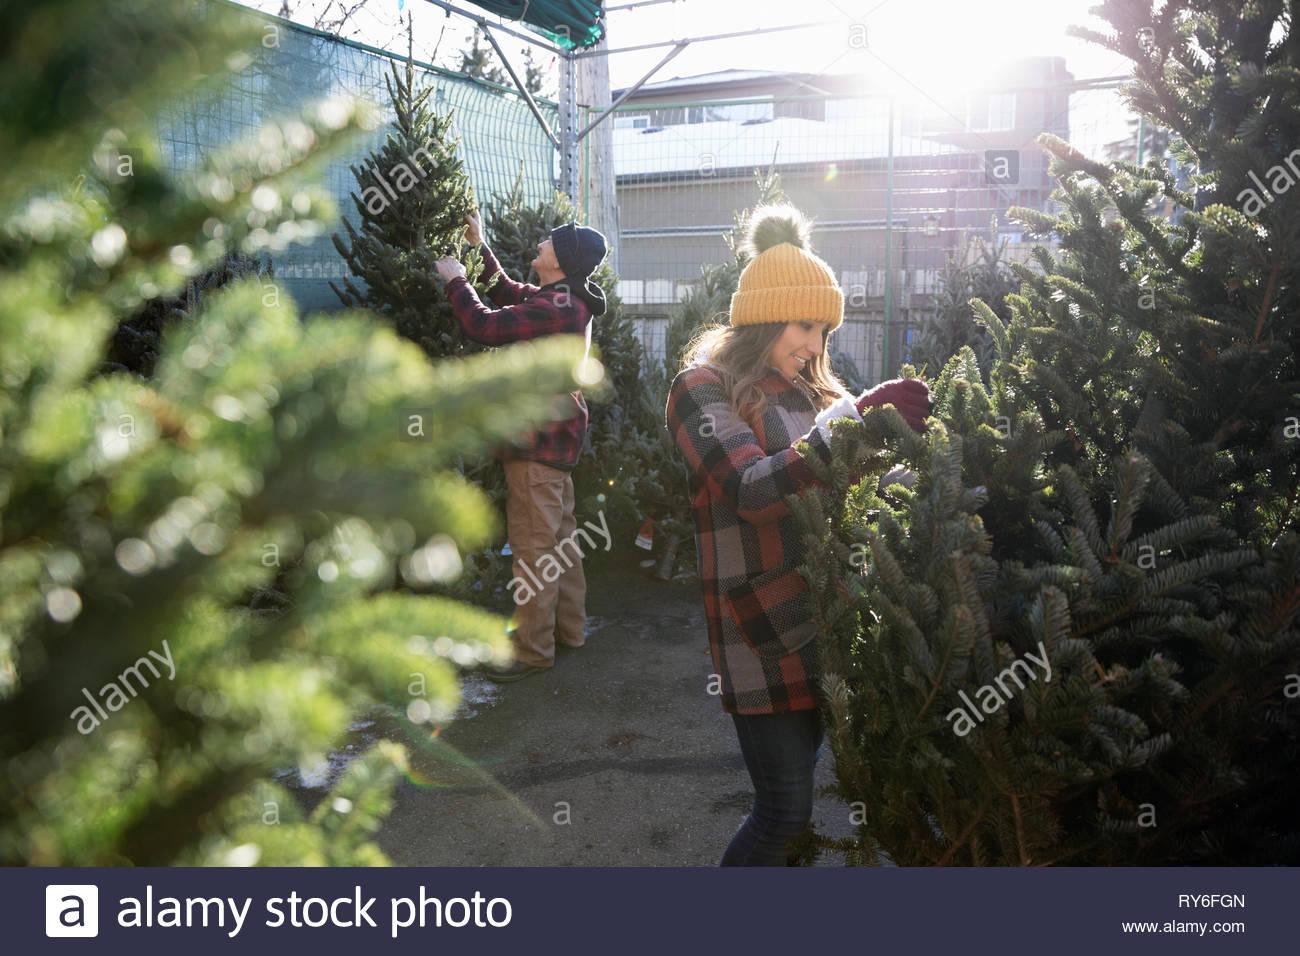 Woman shopping for christmas tree at christmas market - Stock Image